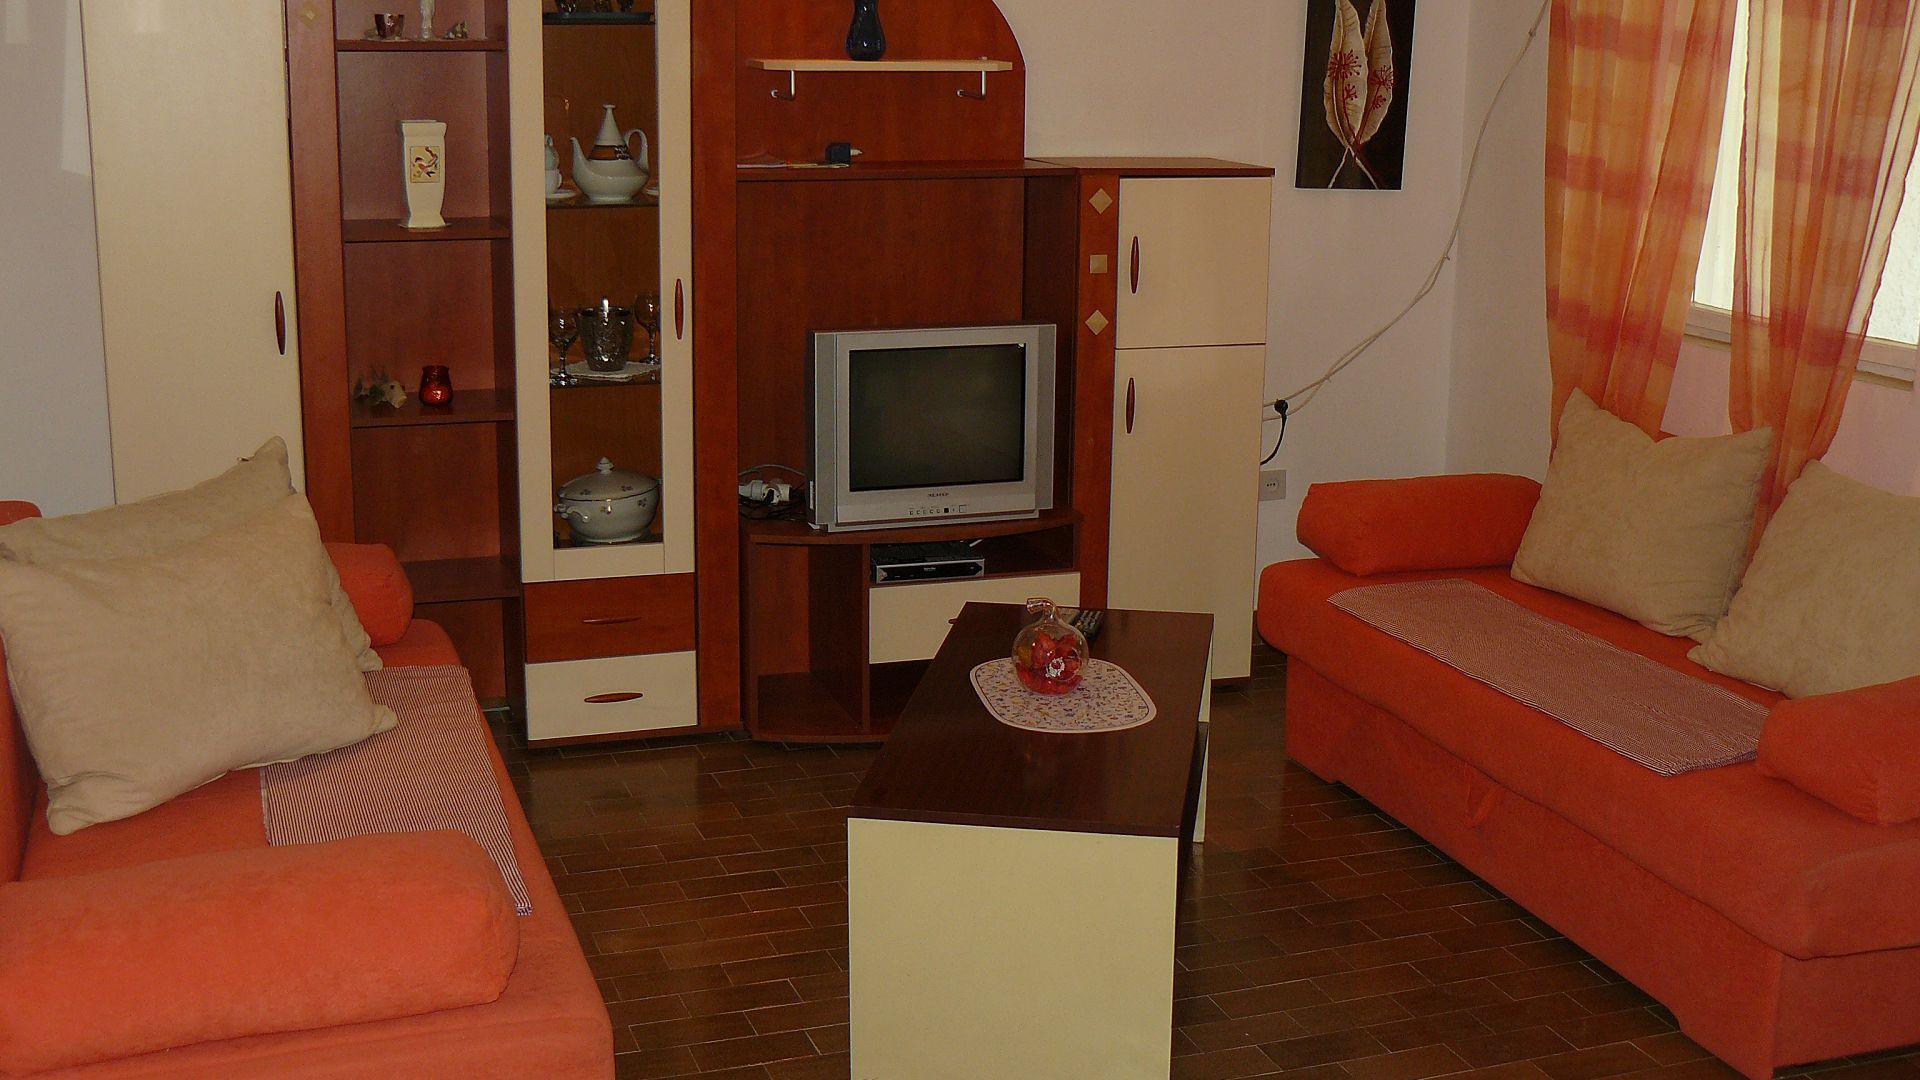 Apartamente Apartment Fran A1 Rogoznica, Riviera Sibenik 52793, Zecevo Rogoznicko, , Šibensko-kninska